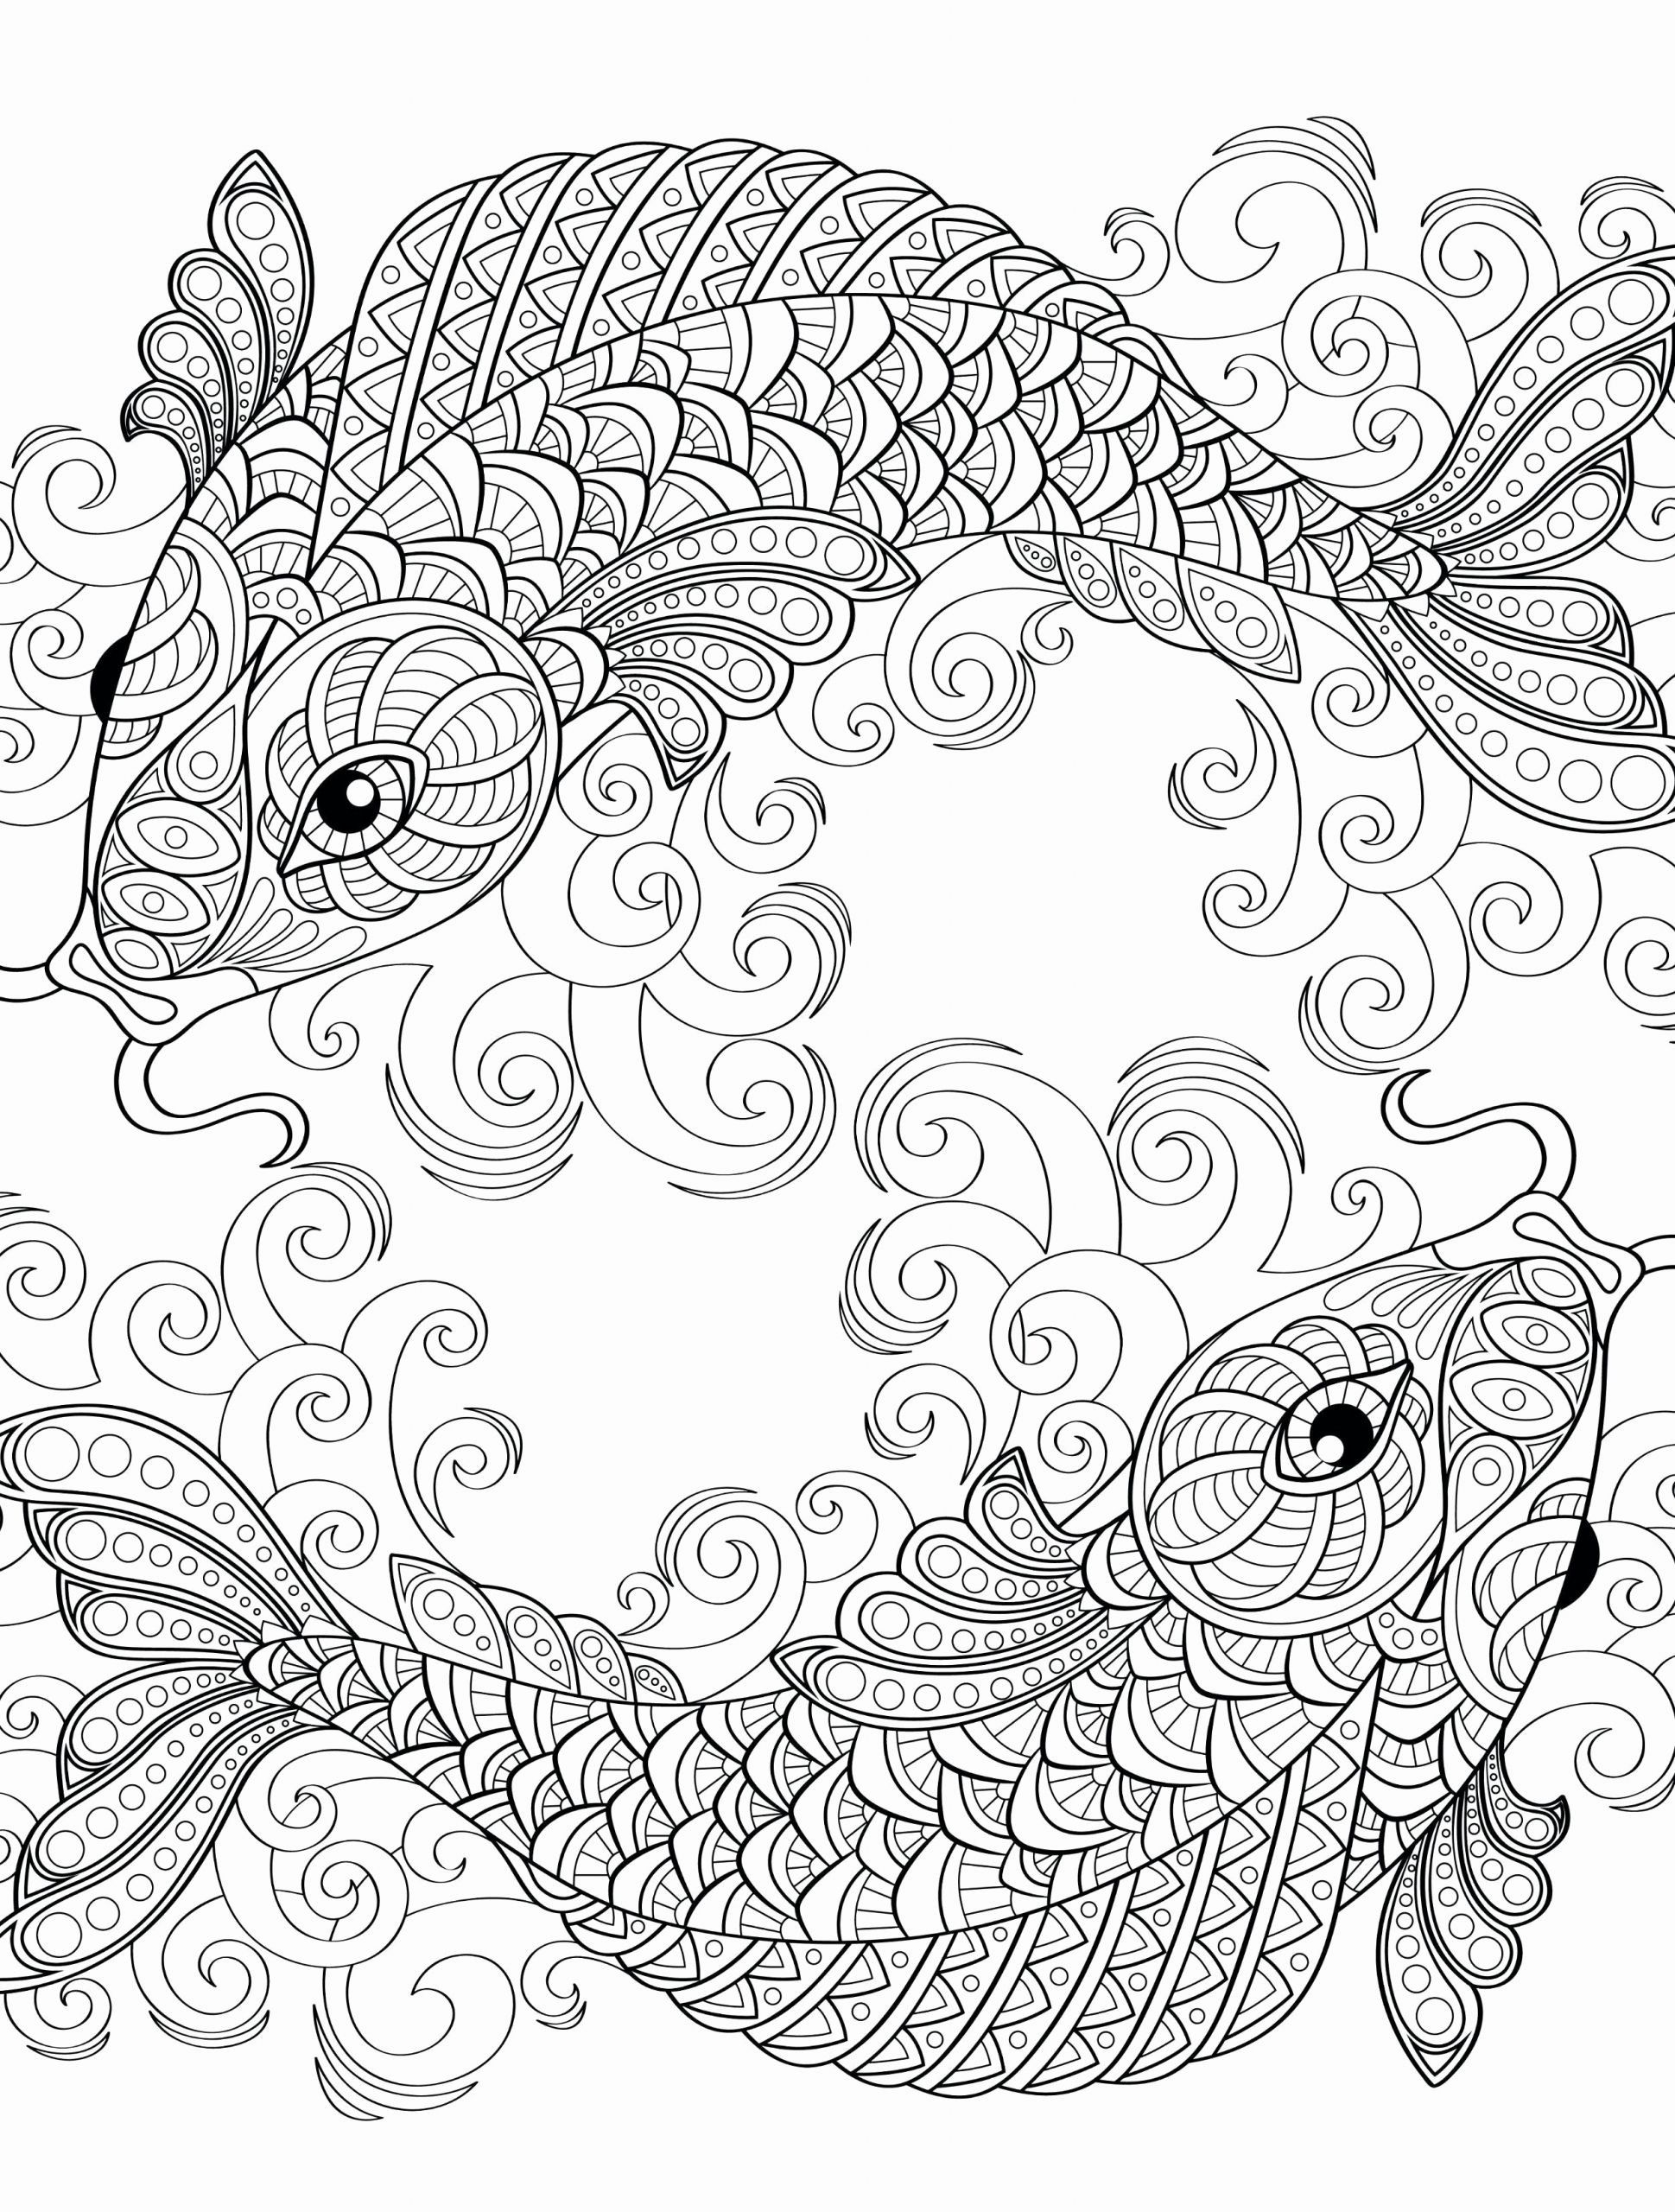 Pond Animals Coloring Pages Elegant Super Bowl 52 Coloring Pages Fresh Arts Fish Coloring Pages Skull Coloring Pages Mandala Coloring Pages Fish Coloring Page [ 2560 x 1939 Pixel ]